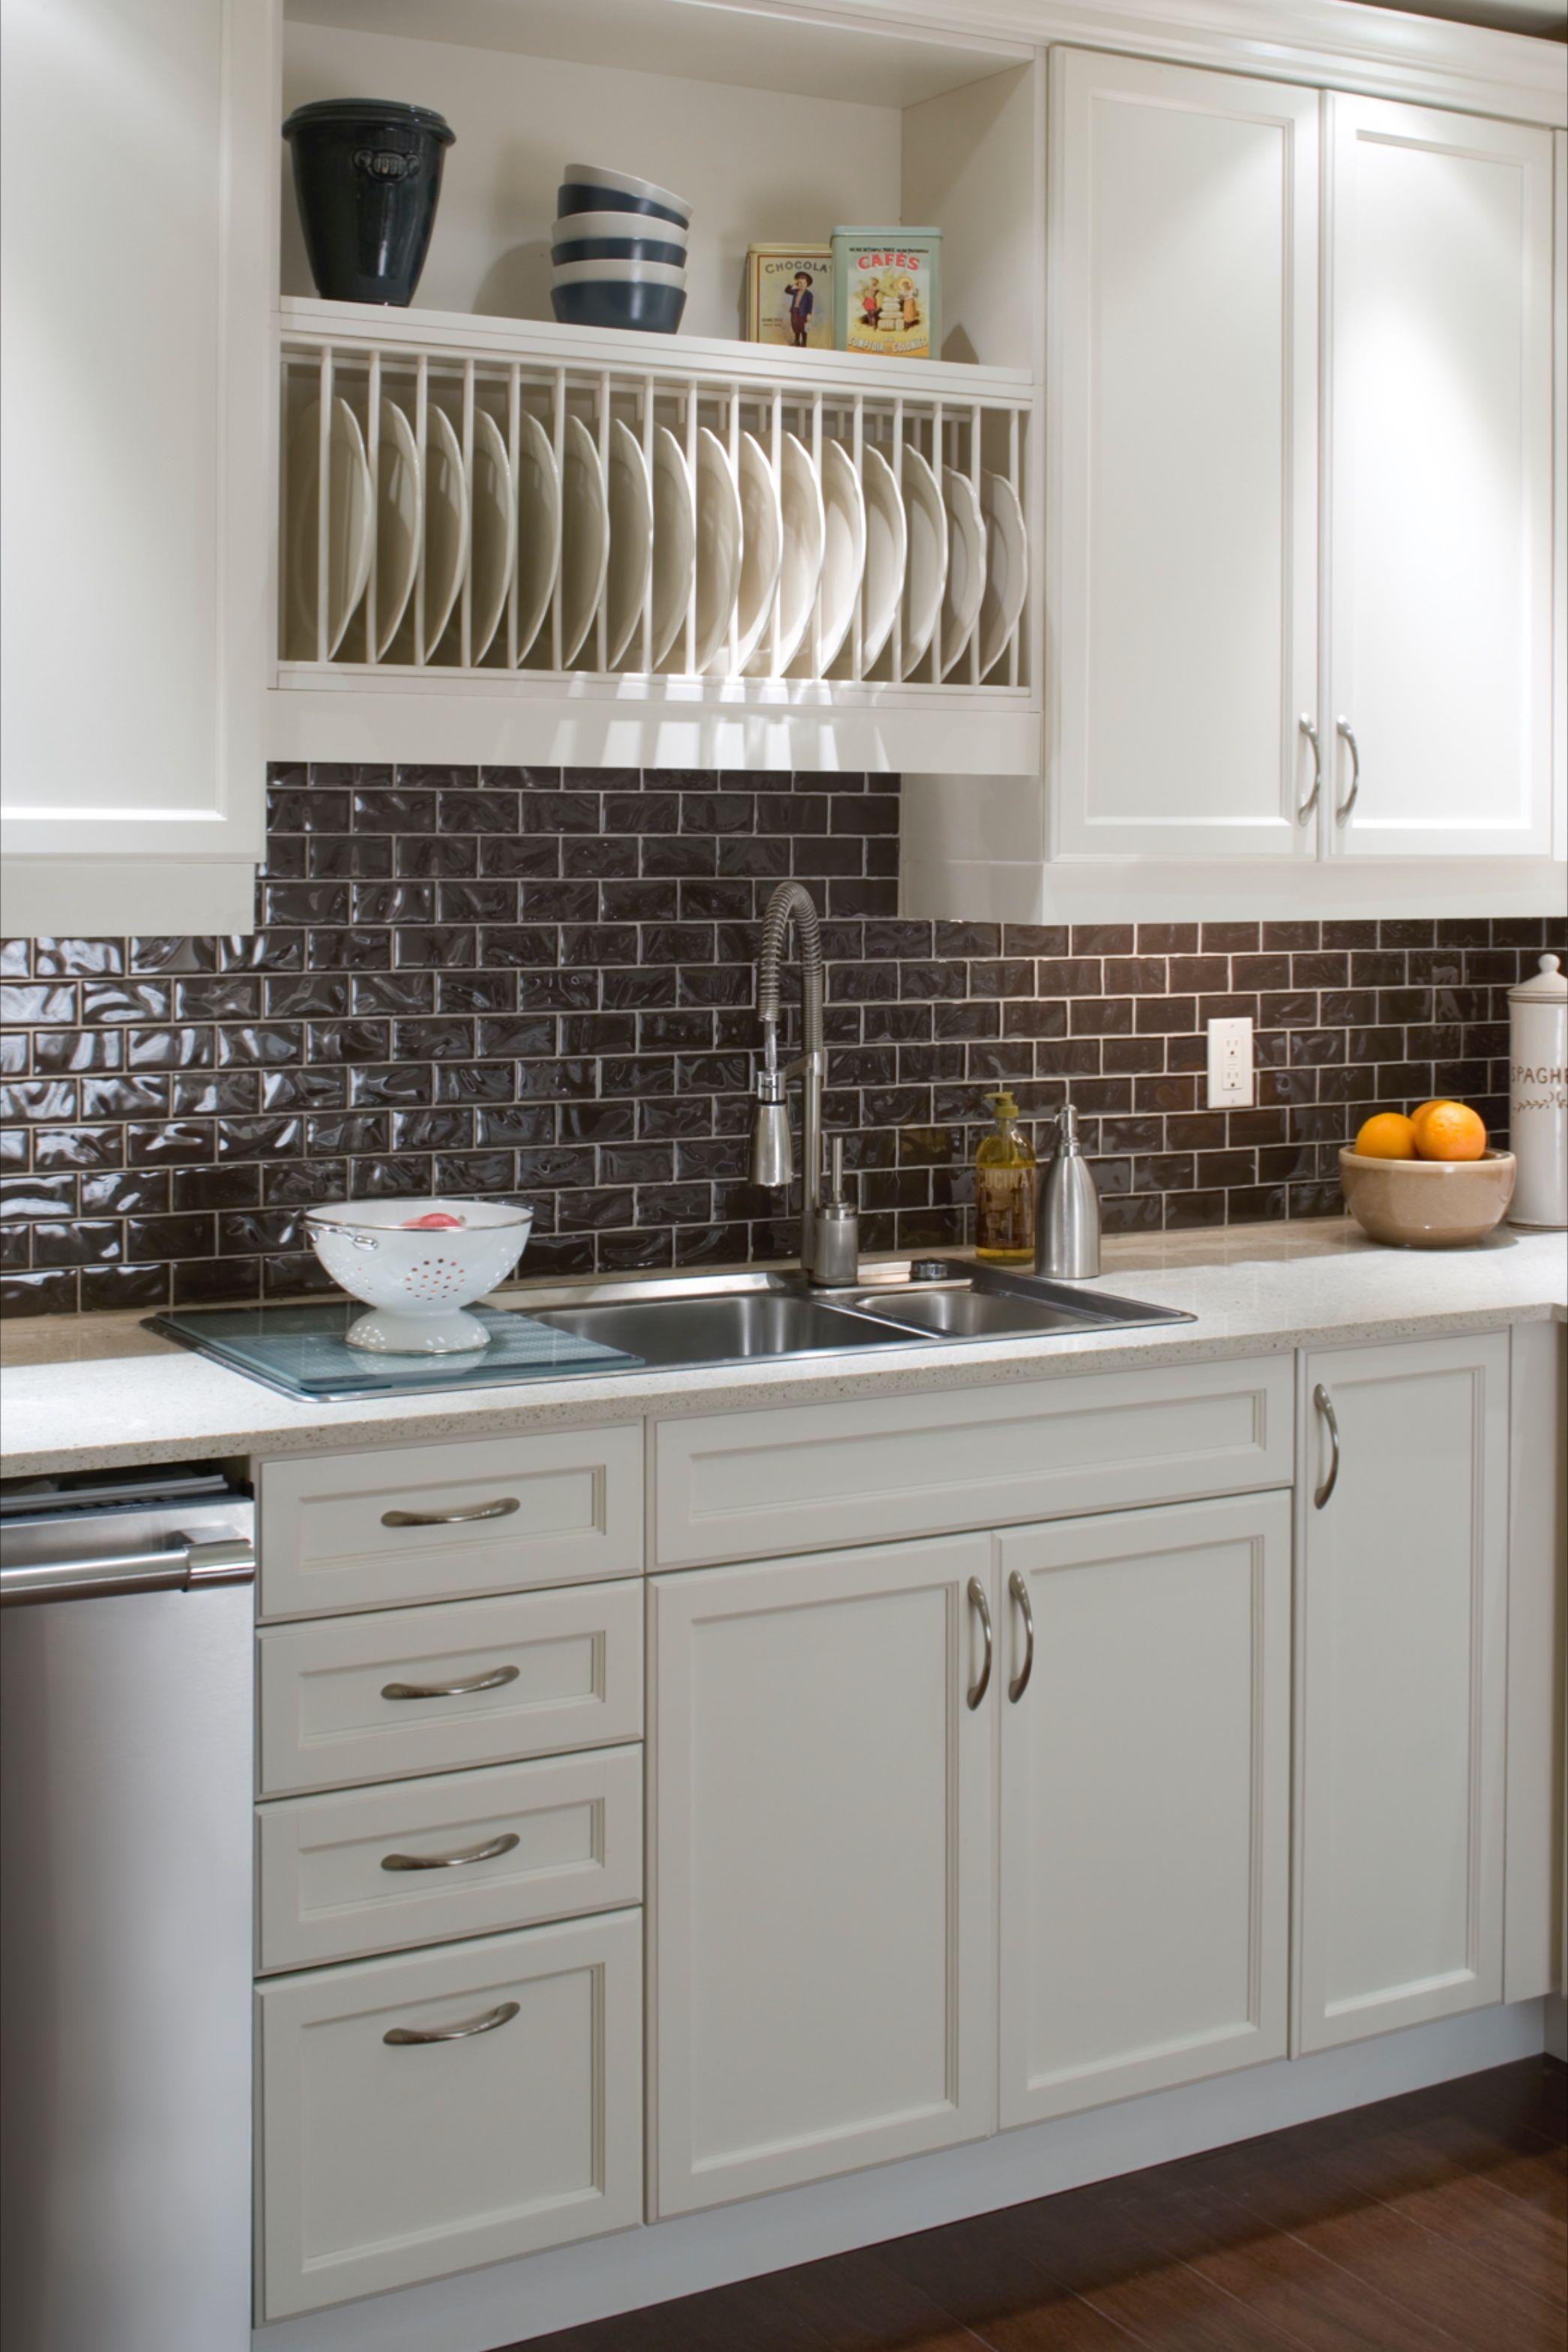 Candice Olson On Cozy Kitchen Design In 2020 Kitchen Inspirations Open Kitchen Cabinets Kitchen